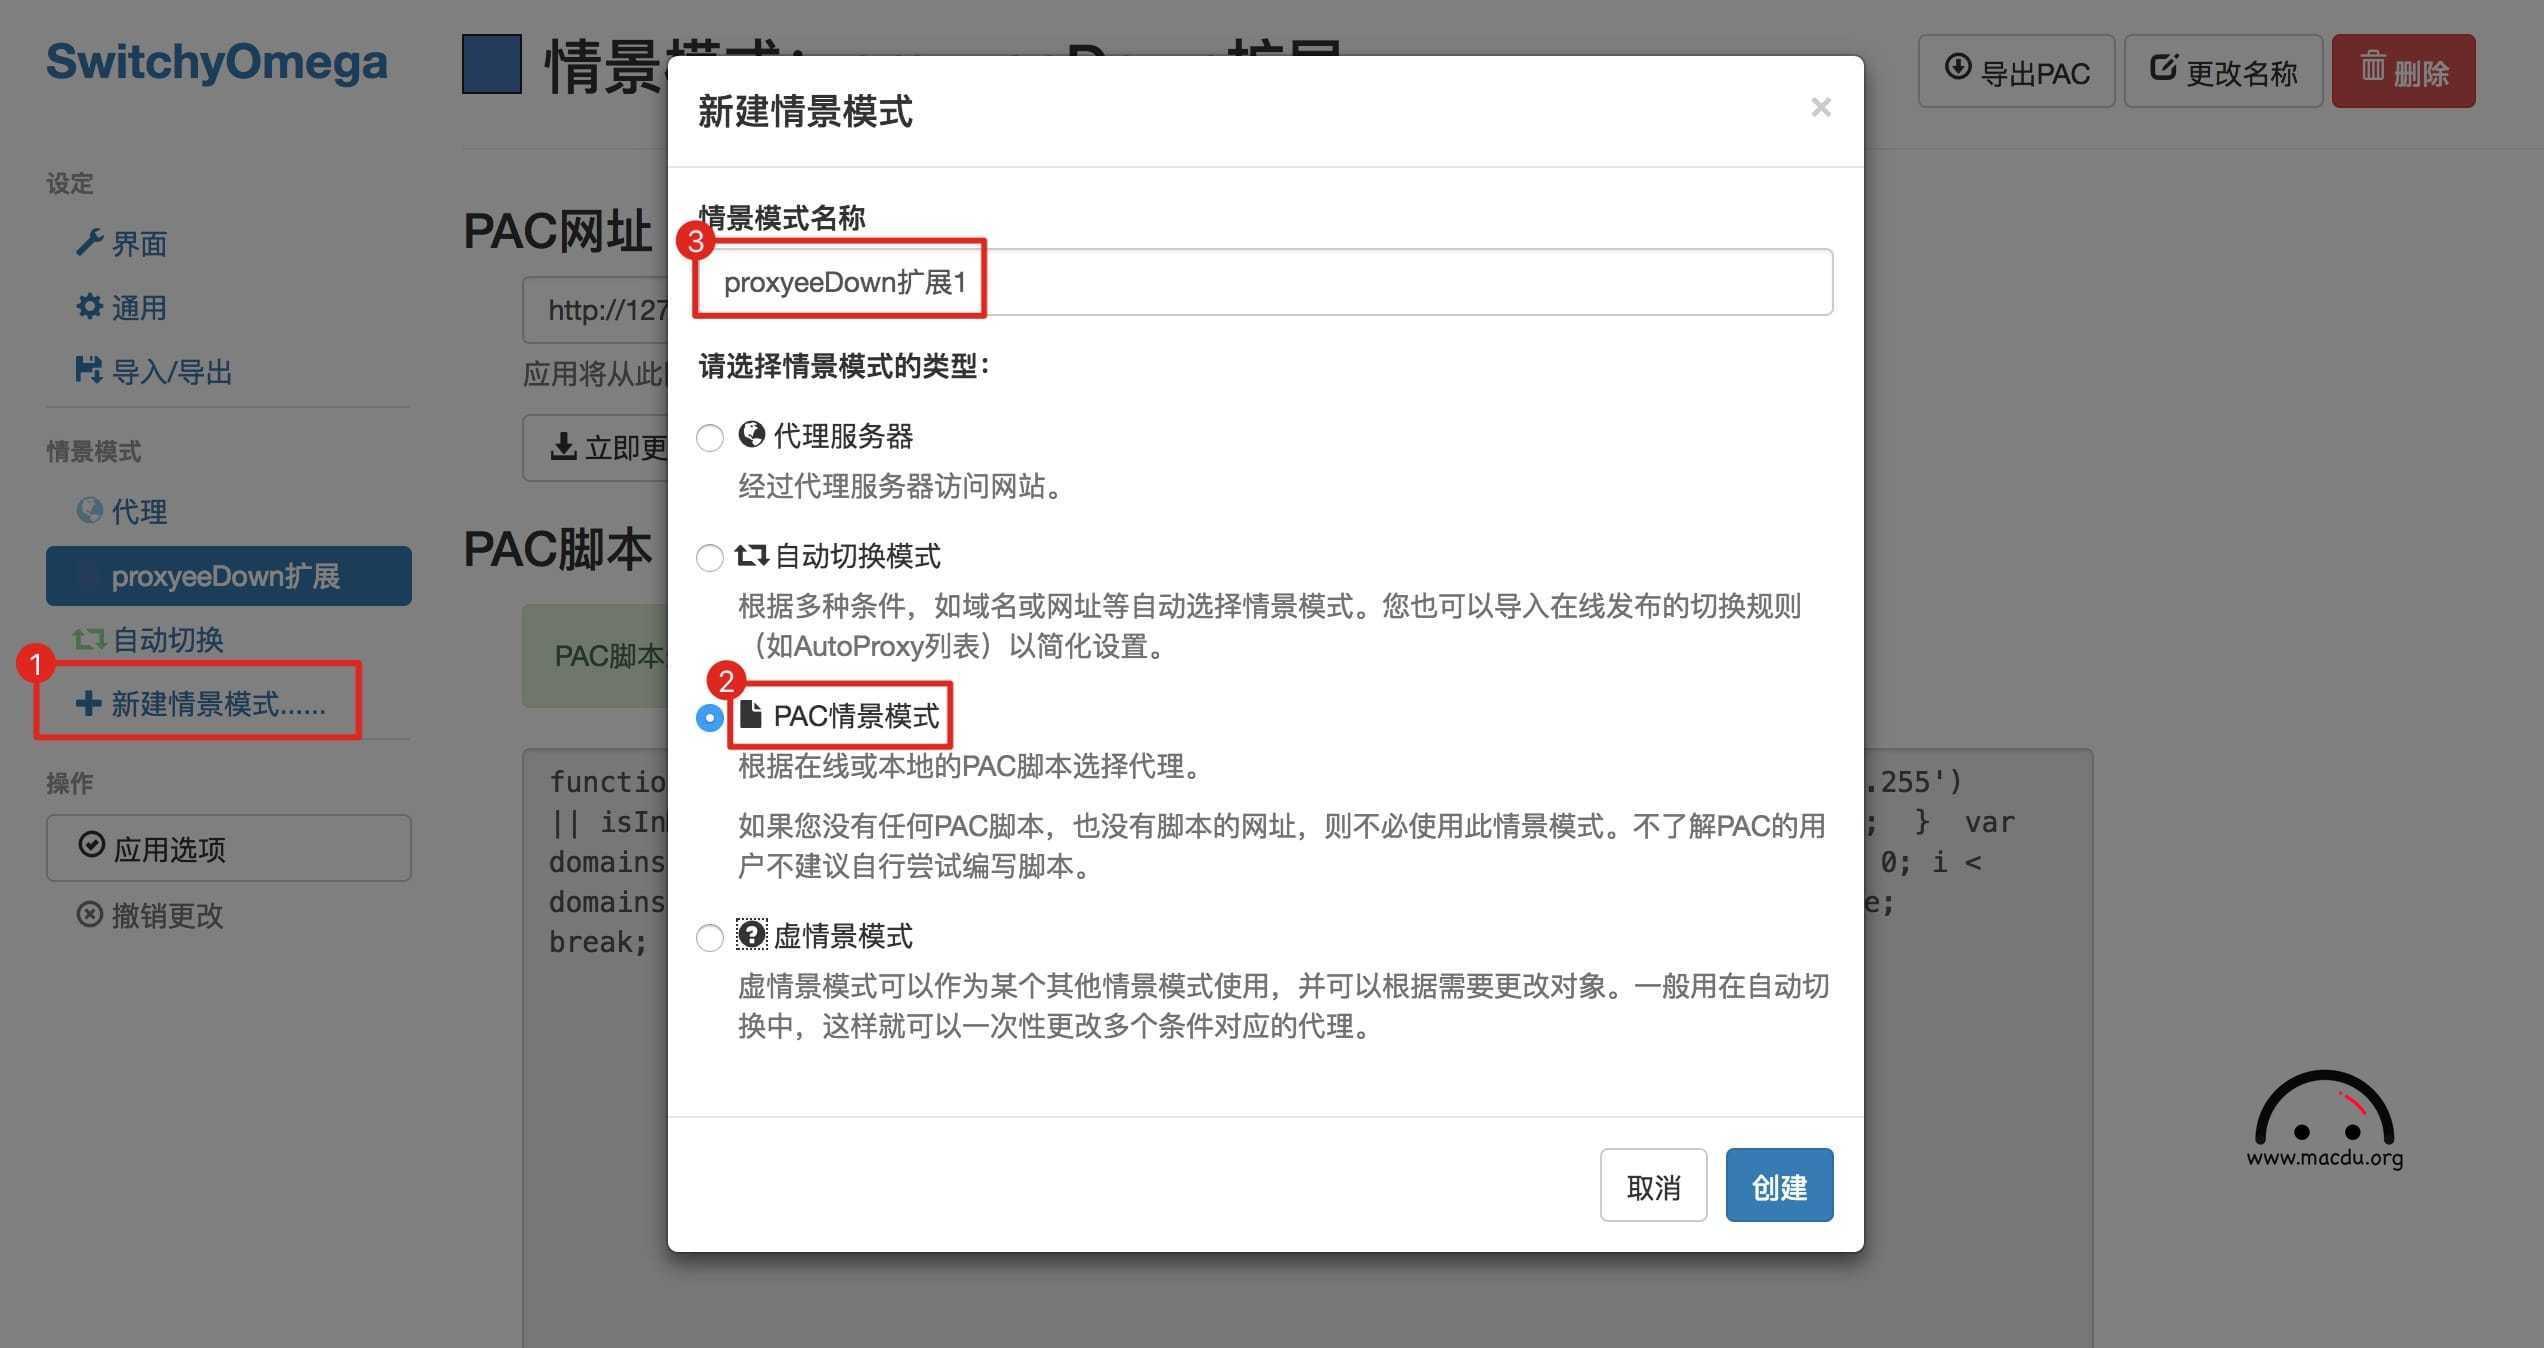 Proxyee Down Baidu network disk high speed downloader detailed use